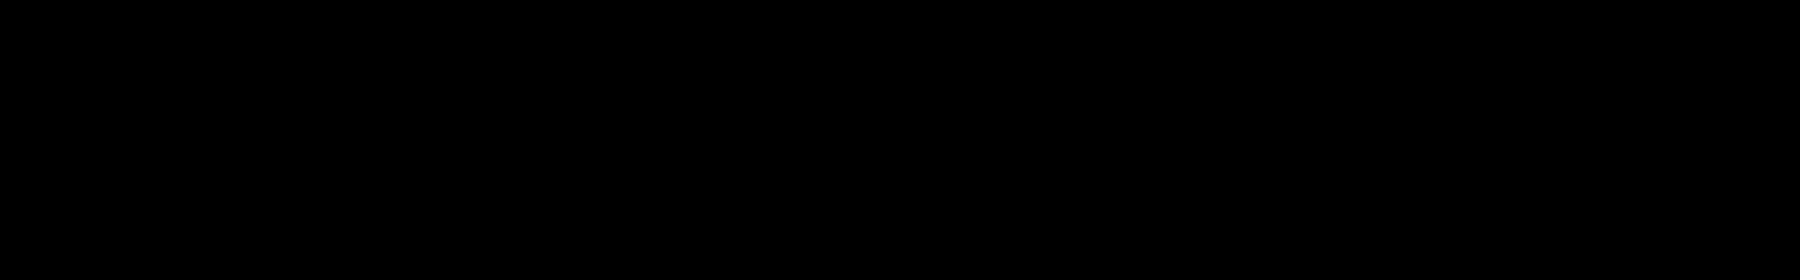 Flugelhorn 1 audio waveform